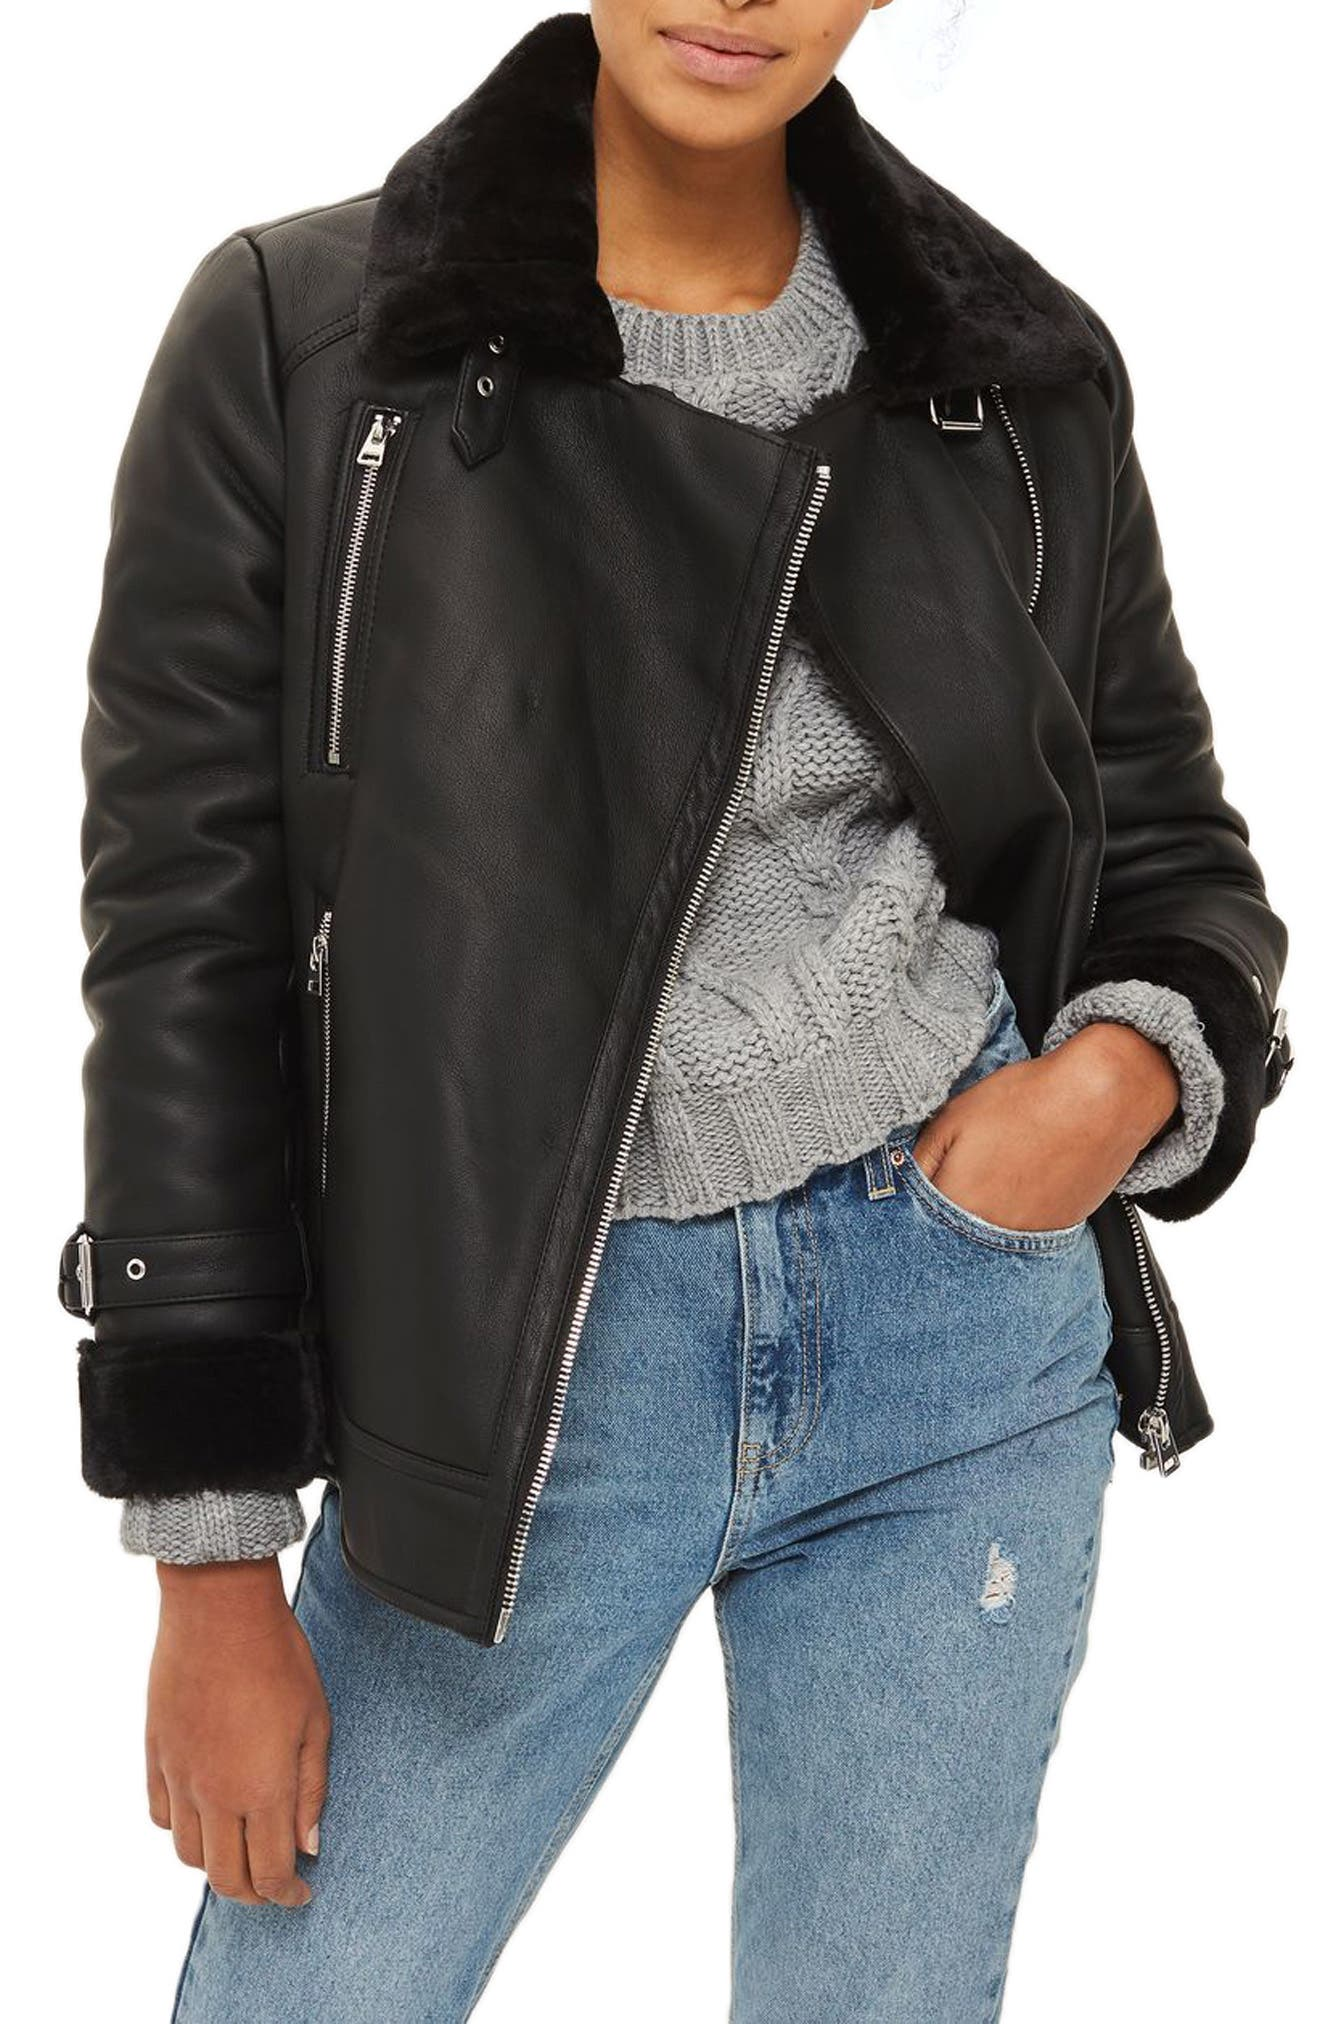 Topshop Lola Biker Jacket